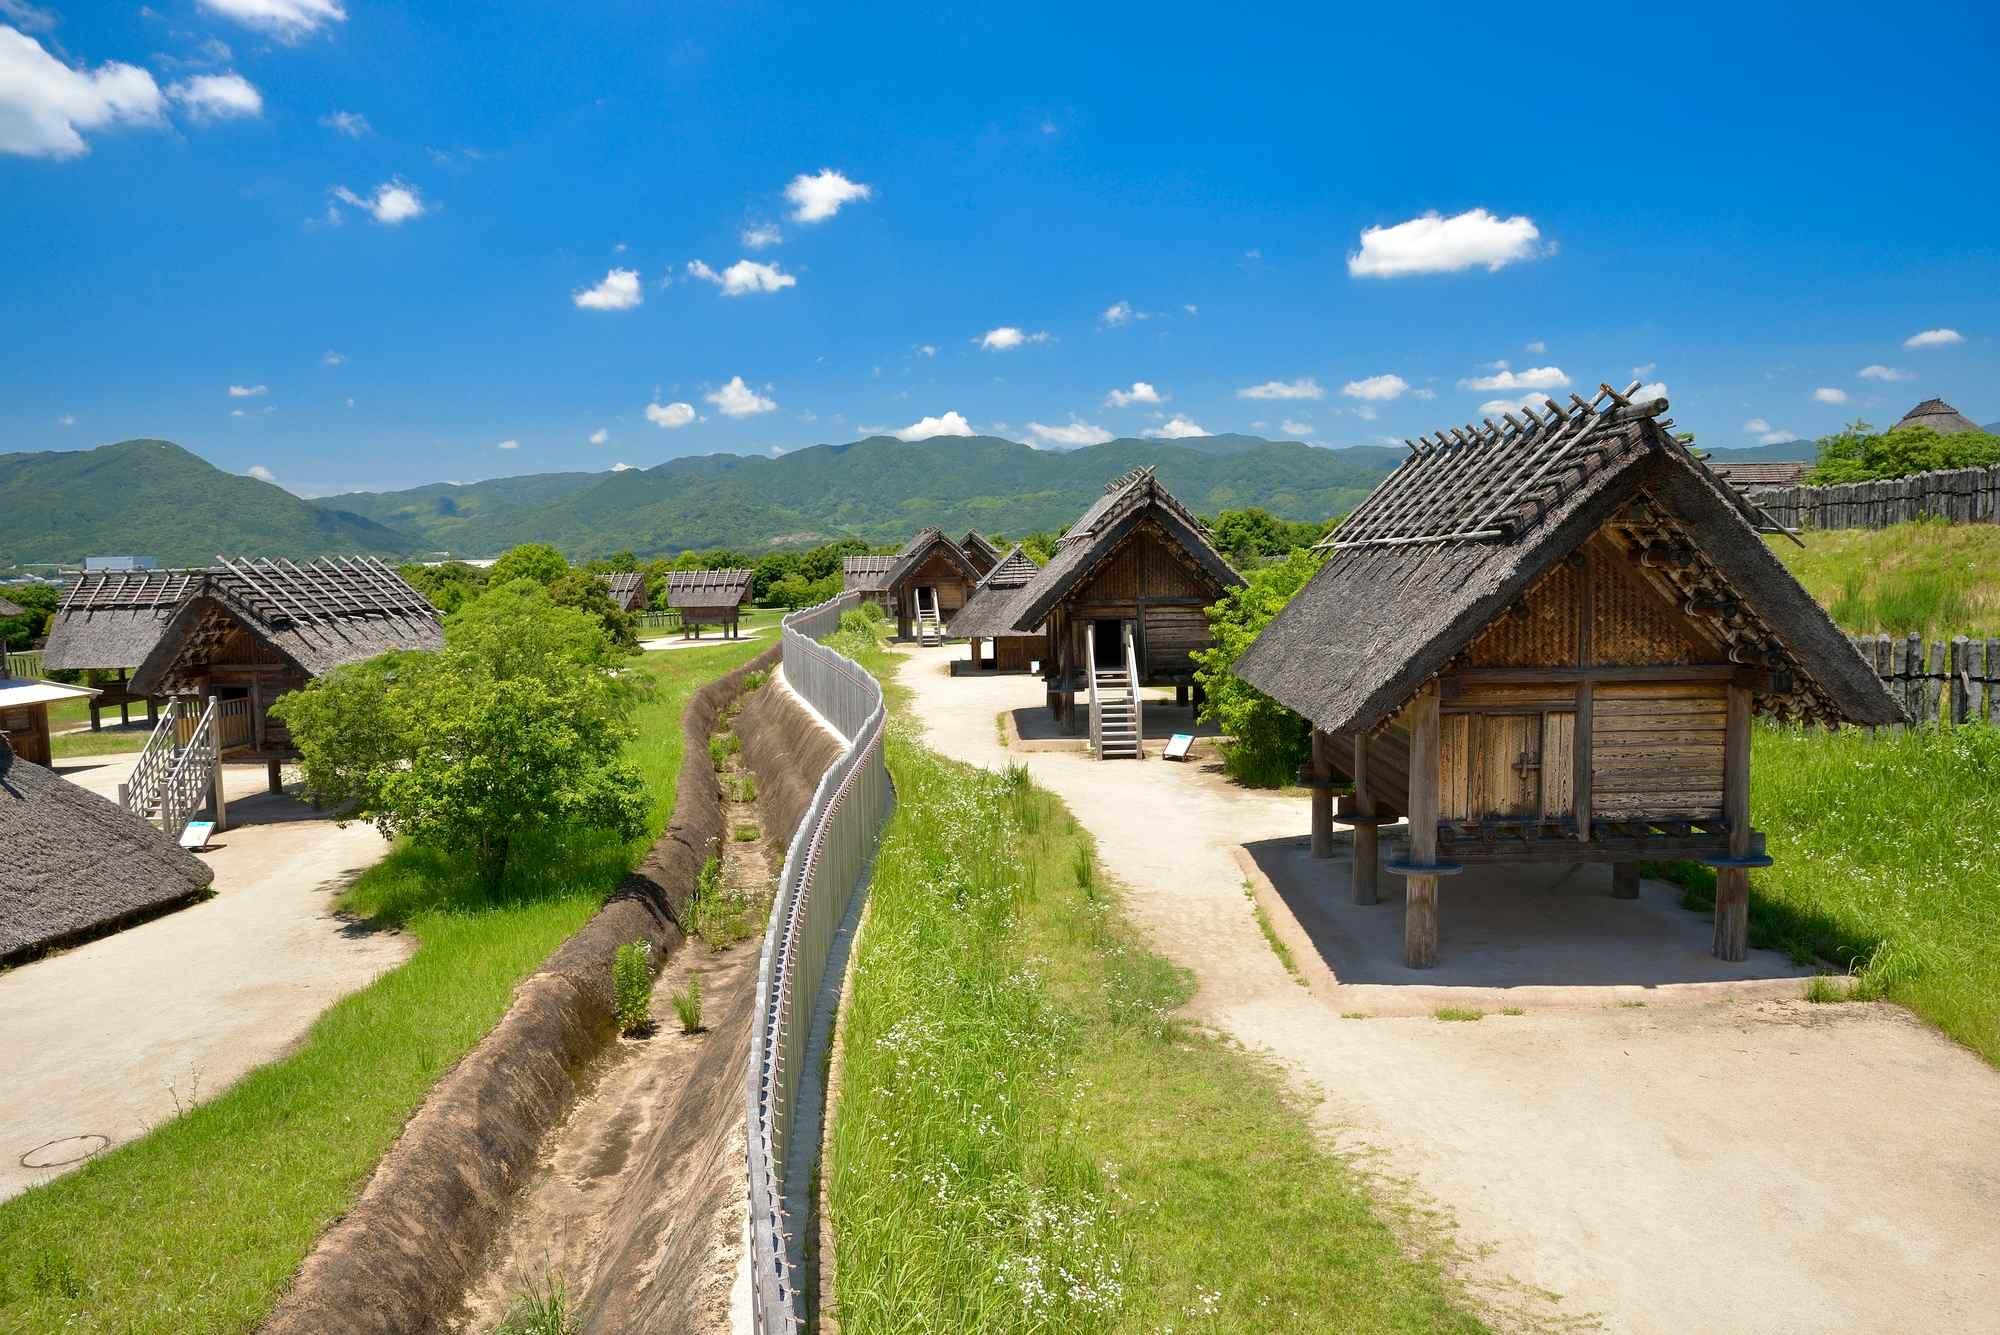 Reruntuhan Taman Bersejarah Yoshinogari